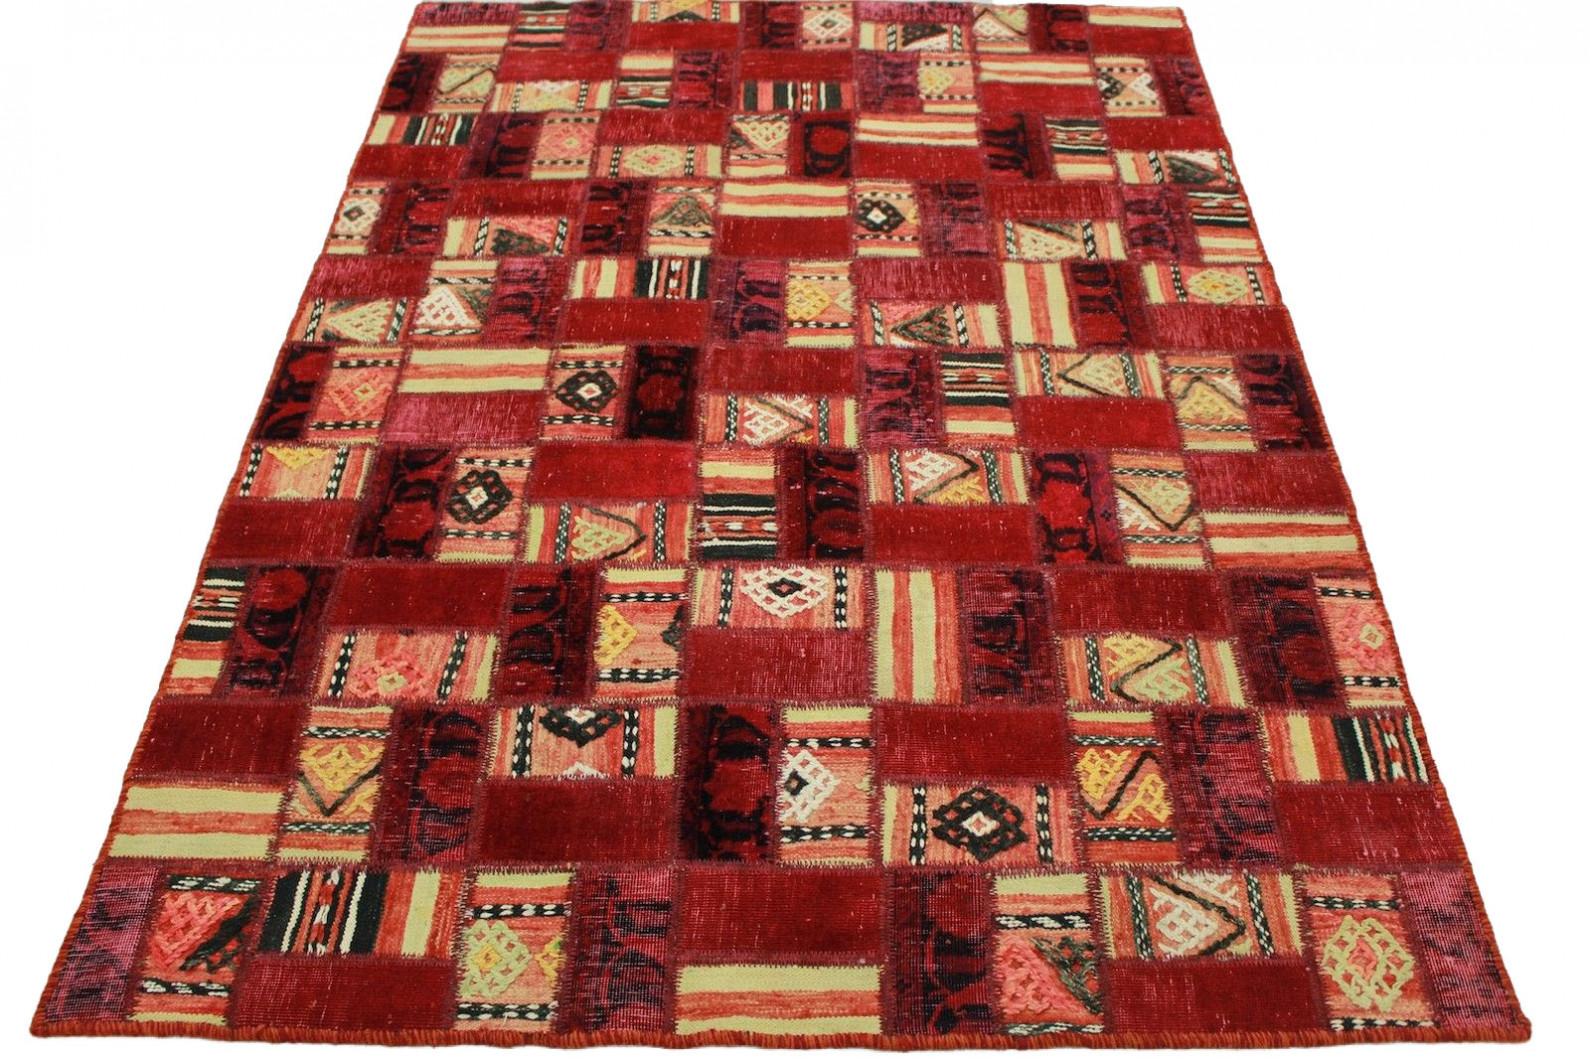 patchwork teppich rot in 200x140cm 1001 2180 bei kaufen. Black Bedroom Furniture Sets. Home Design Ideas